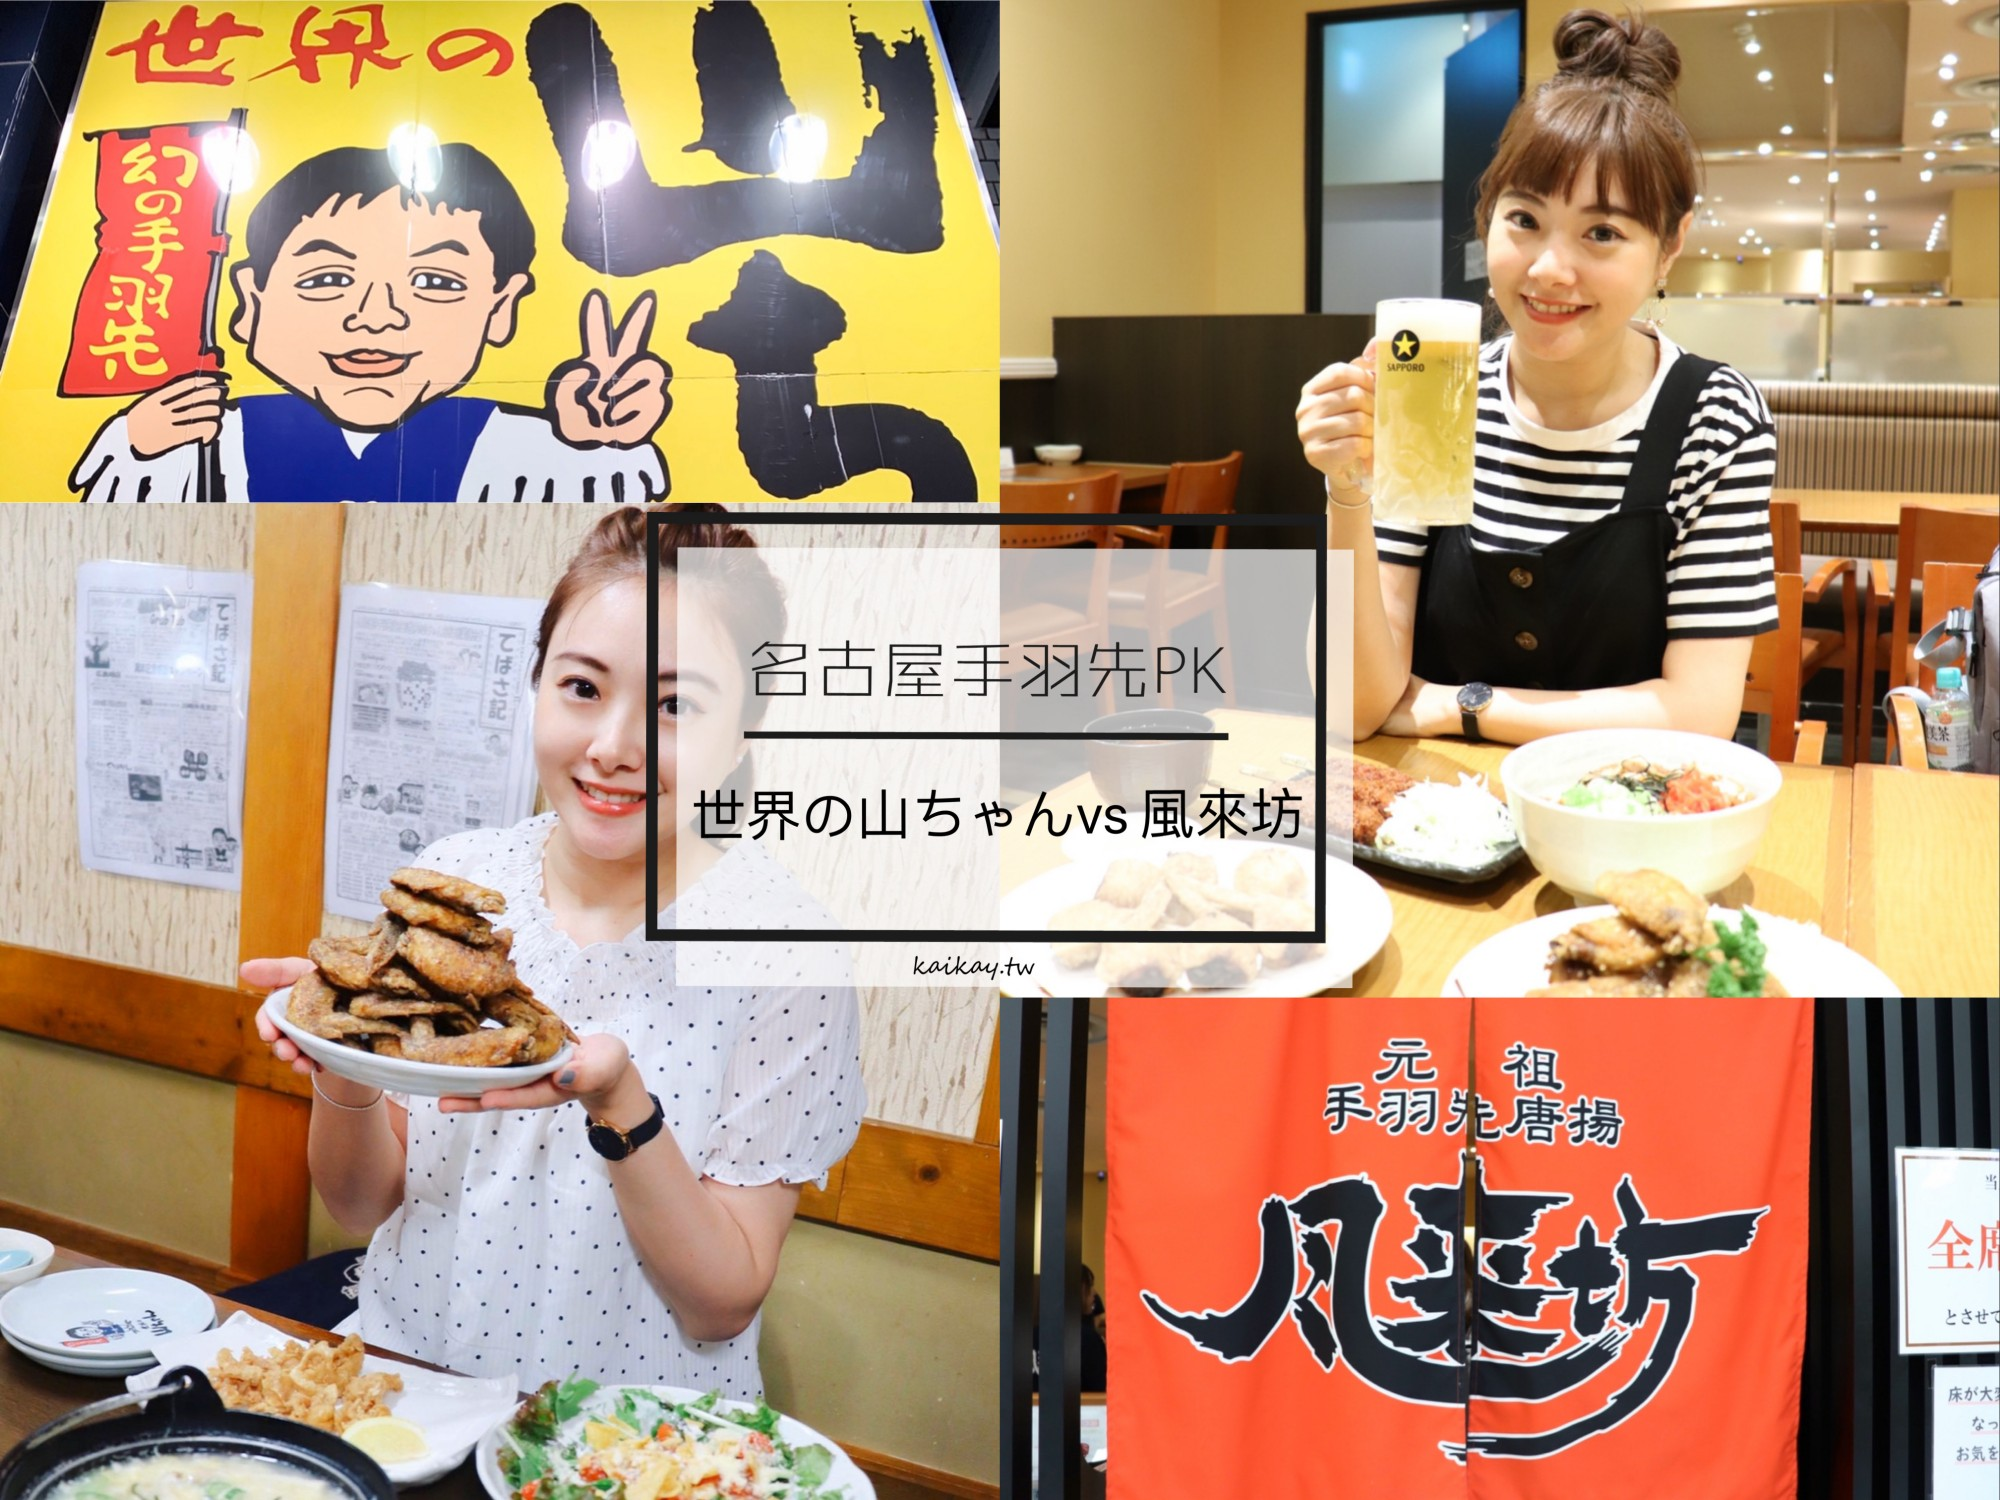 ☆【2019。名古屋】名古屋手羽先雙巨頭:世界の山ちゃん vs 風來坊 @凱的日本食尚日記